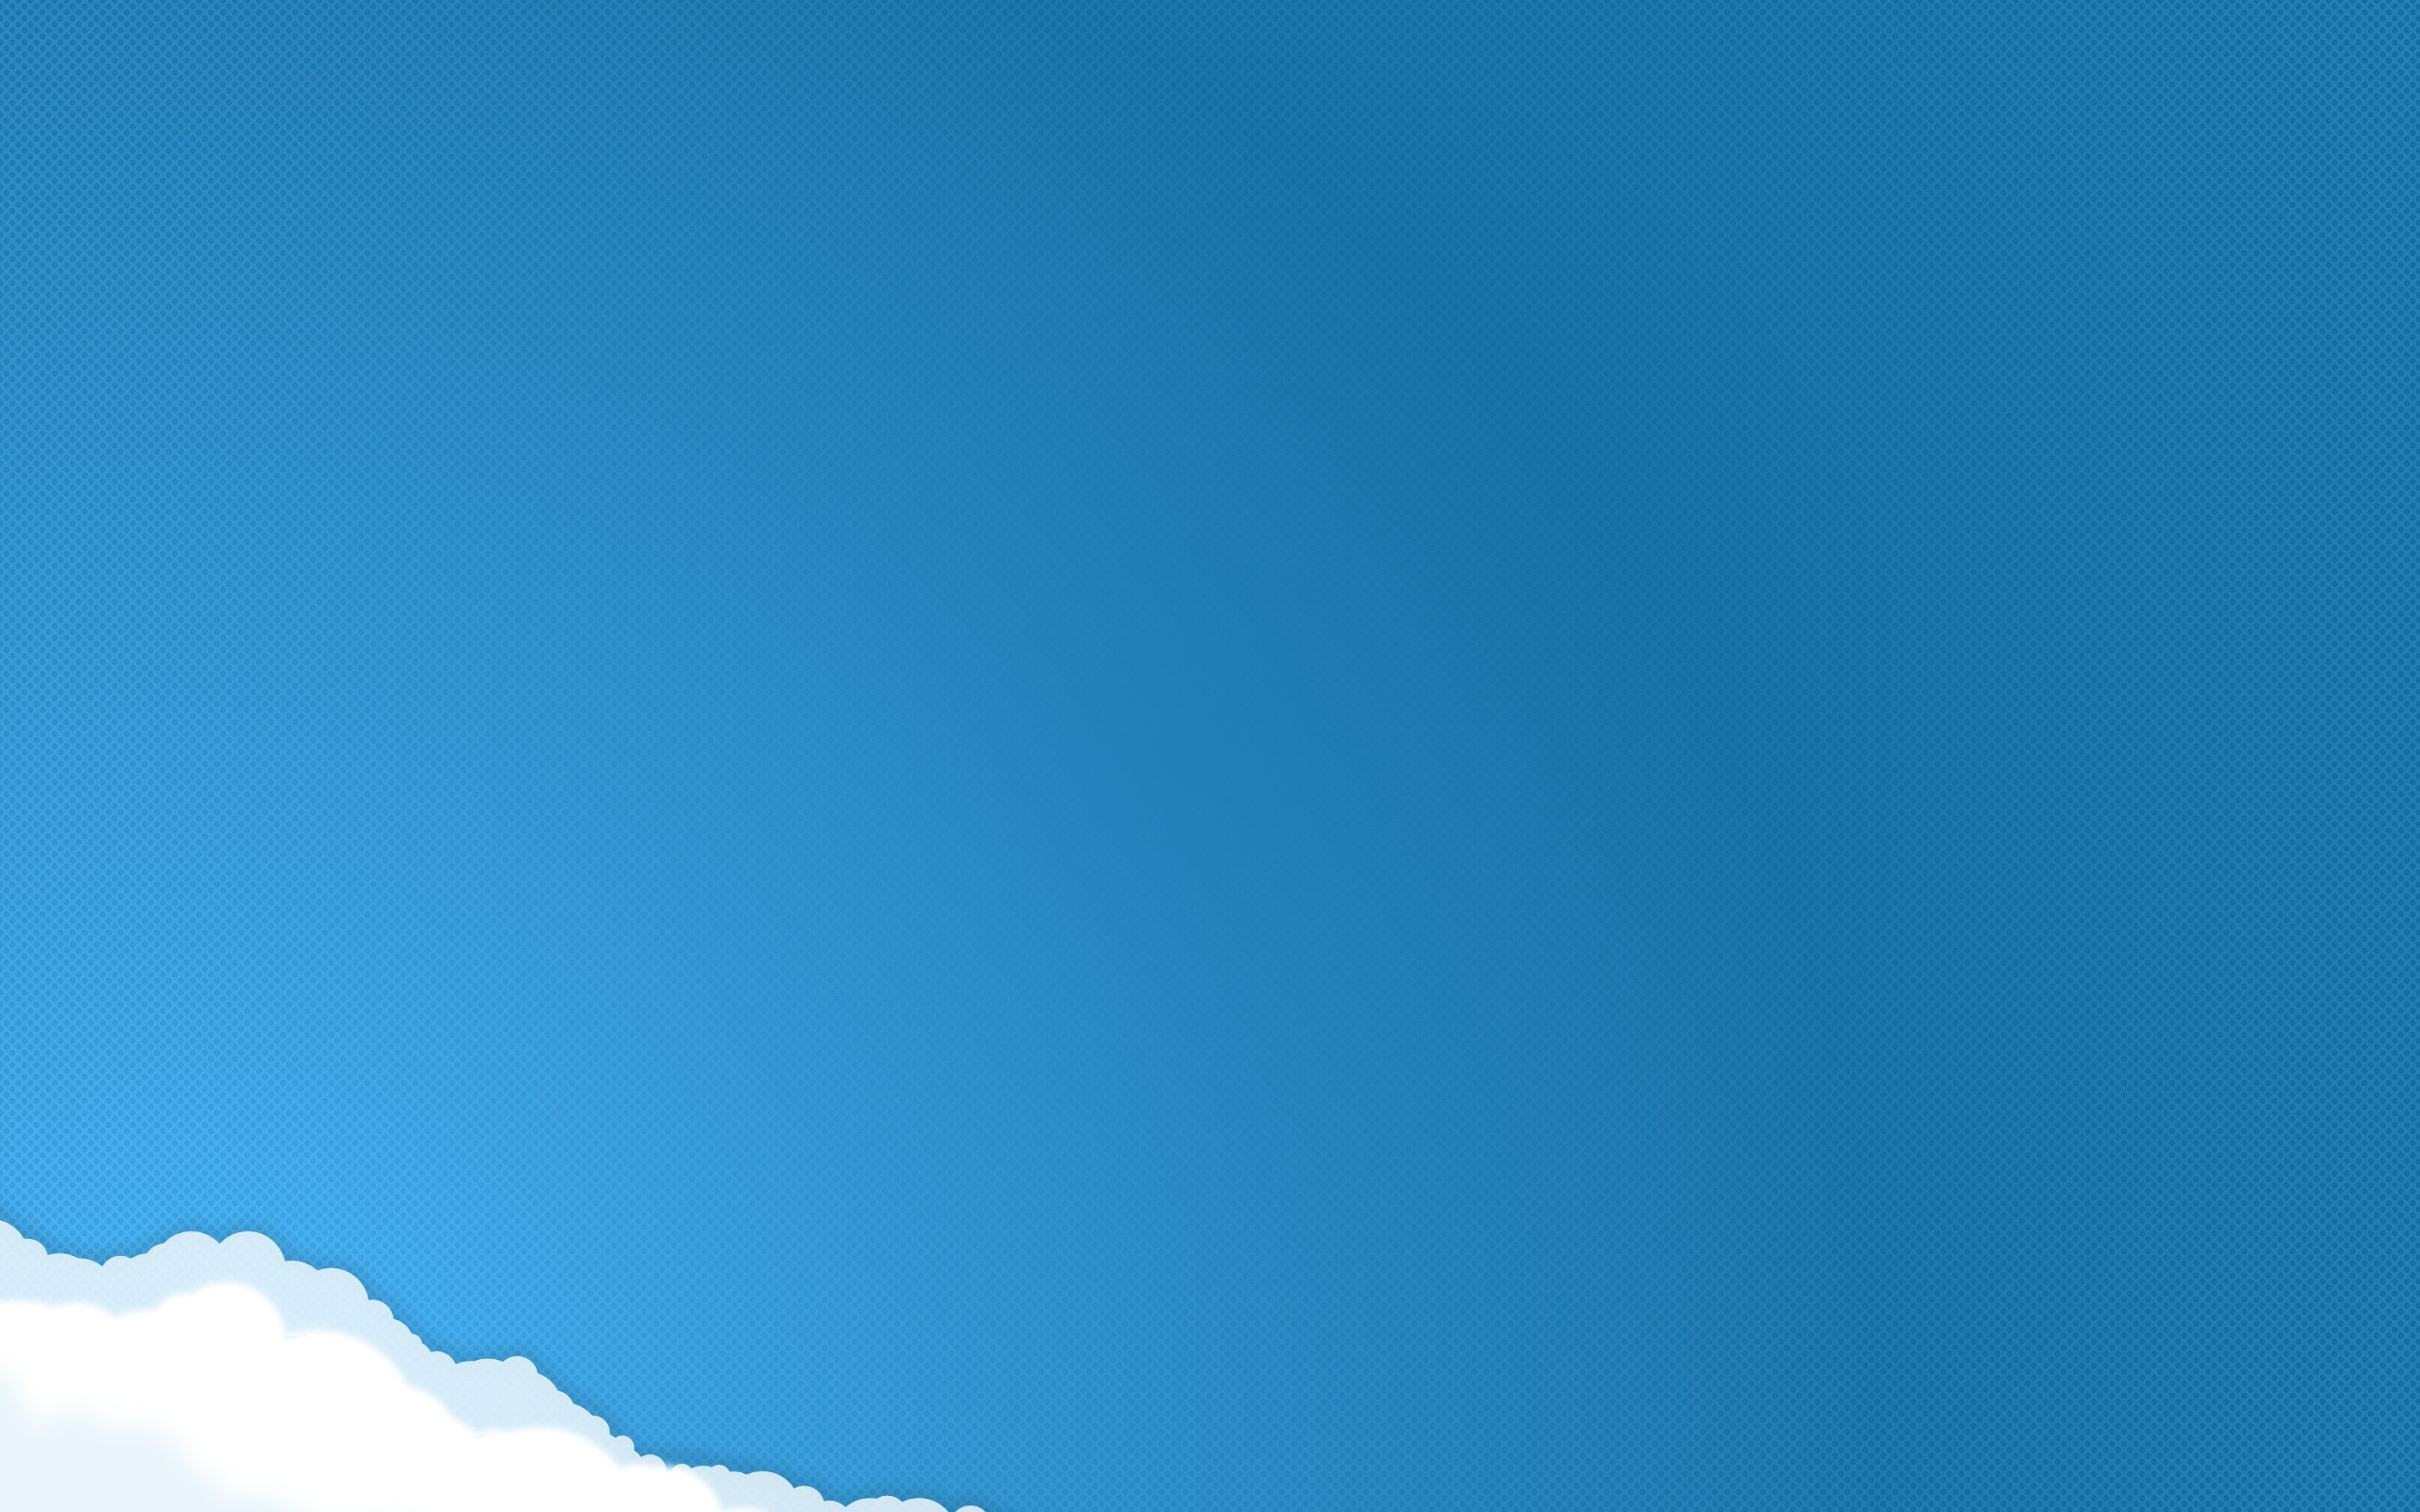 plain blue wallpaper HD 2560x1600